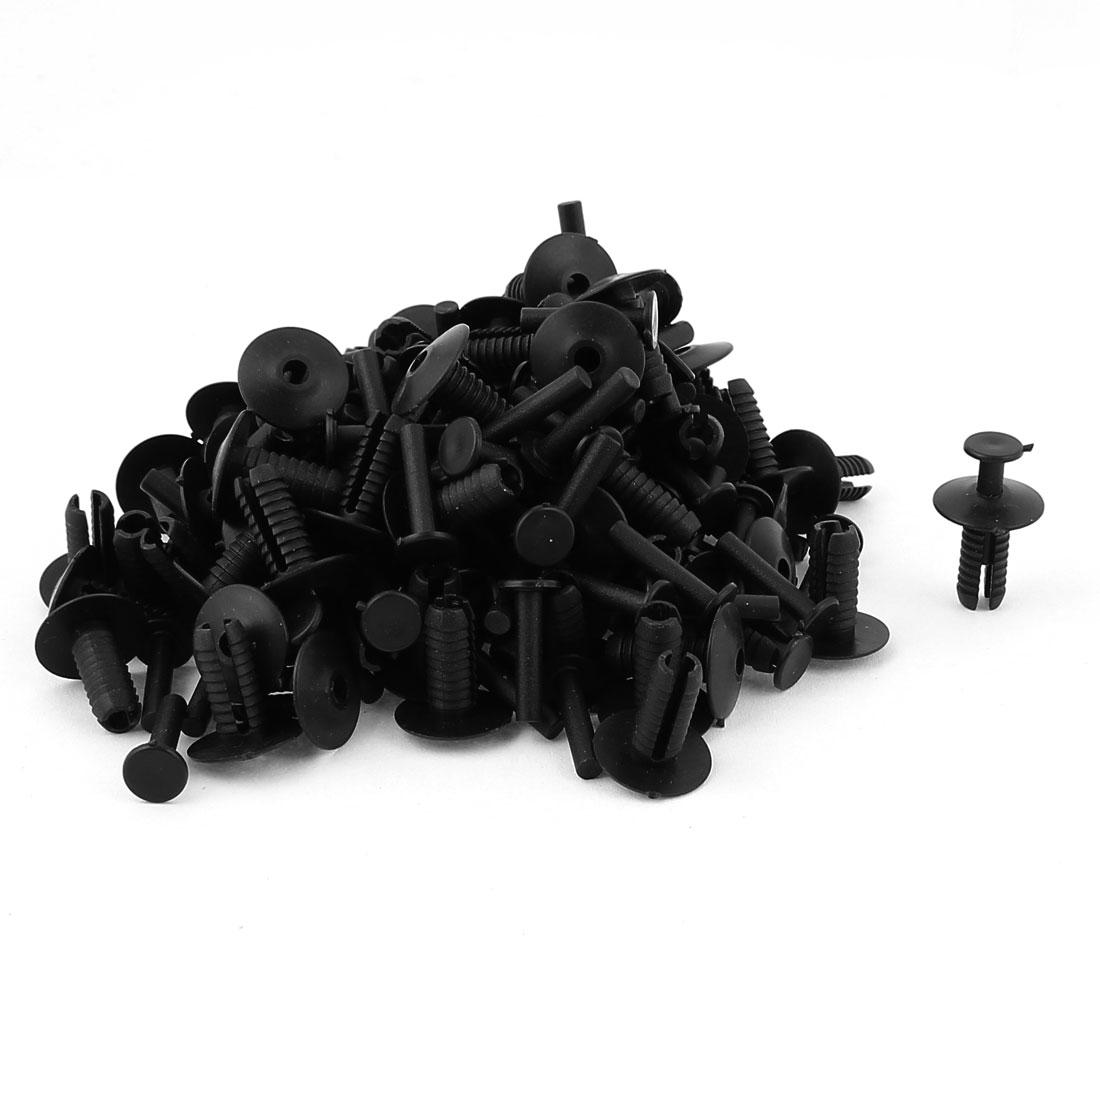 80Pcs Black Plastic Rivet Push Fit Panel Trim Fastener Clips for Car Motor Fairing